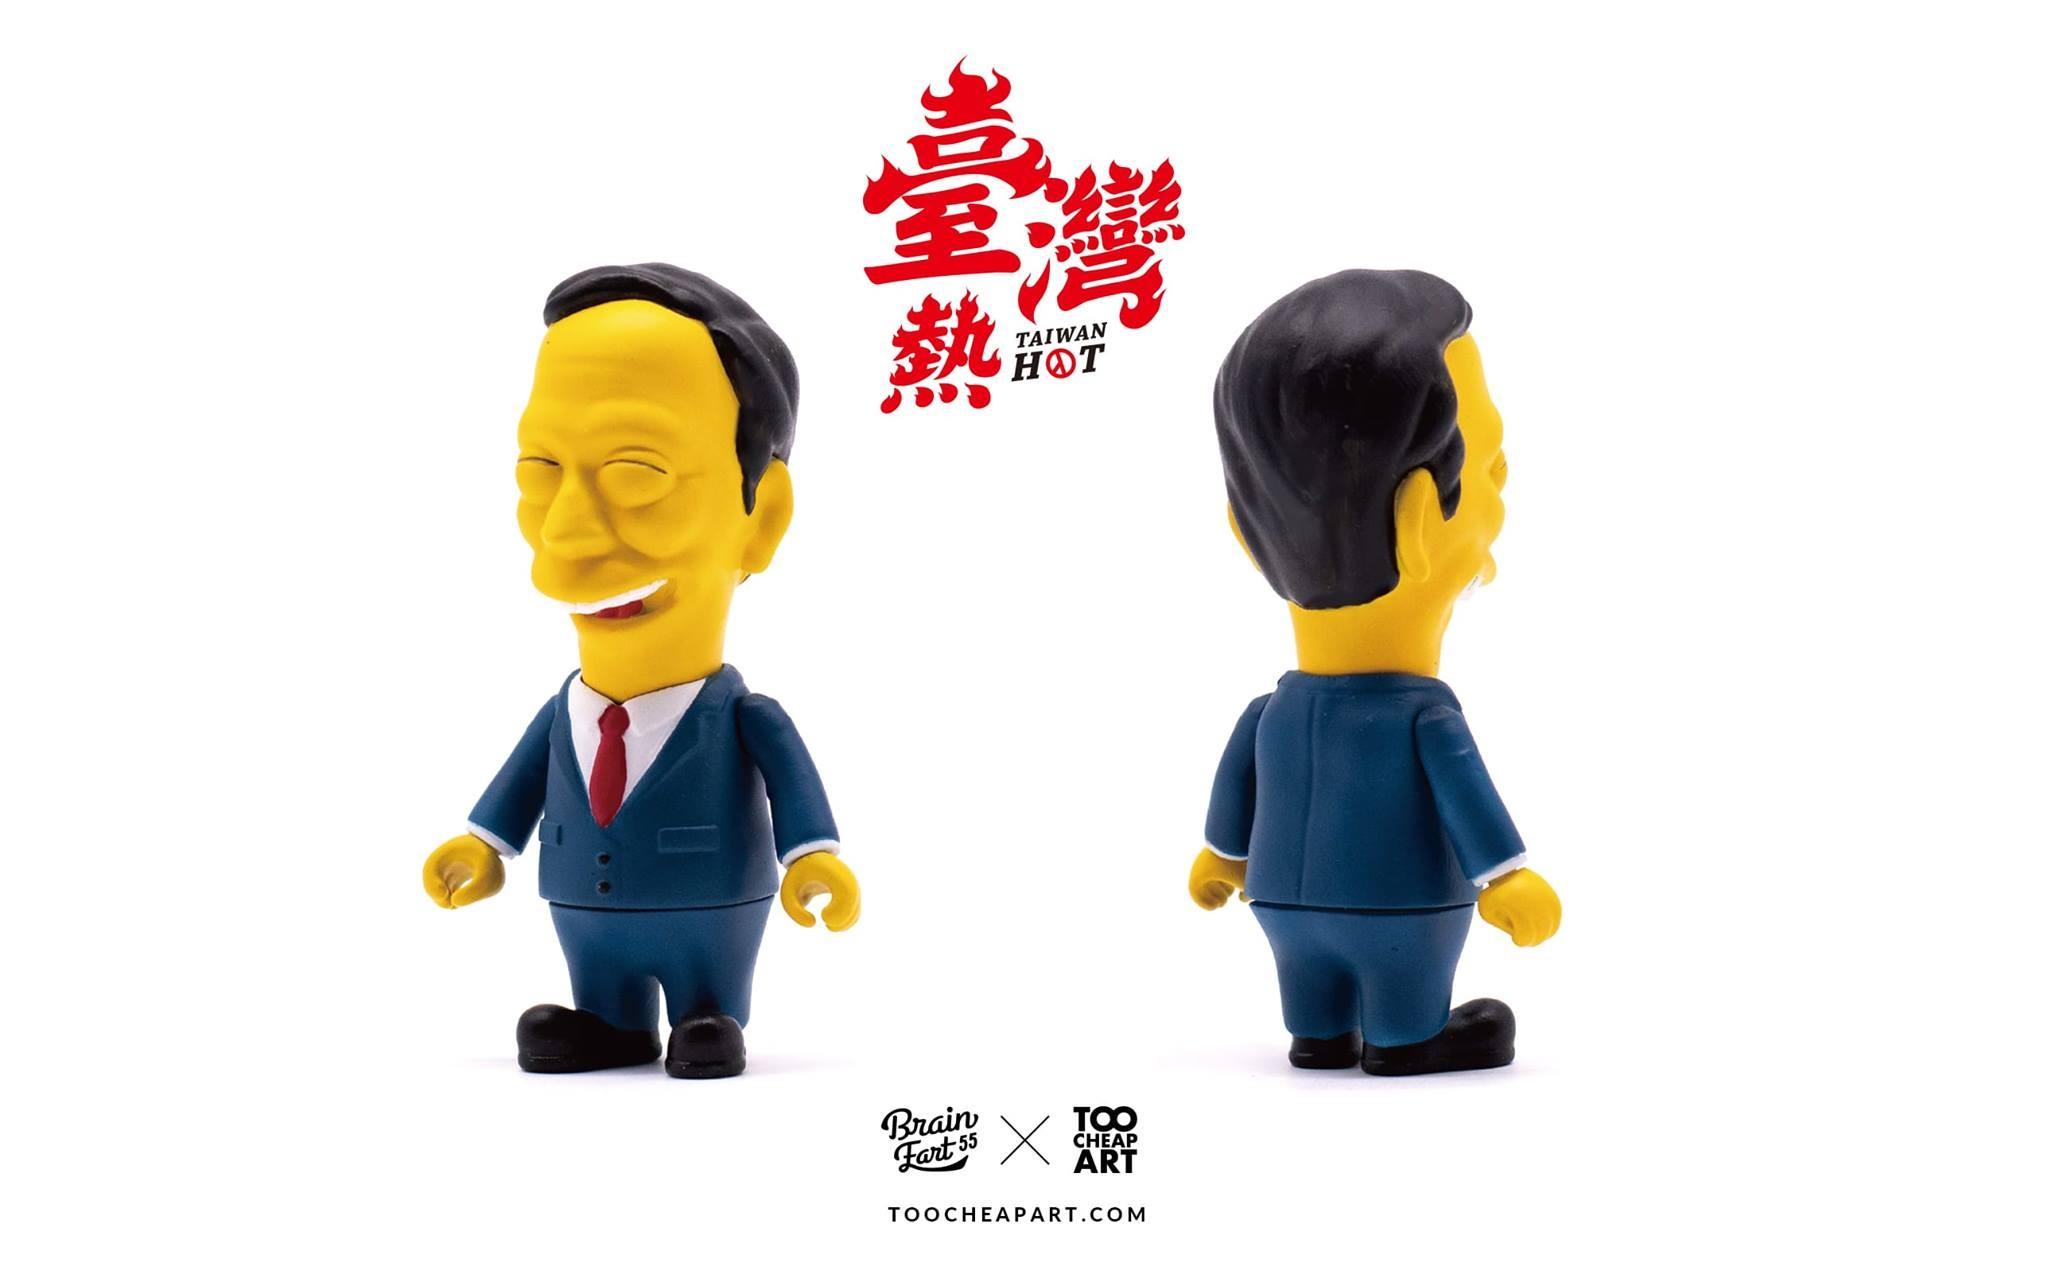 ▲▼Too Cheap Art x Brainfart55腦室設計 政治玩具公仔。(圖/Too Cheap Art提供,請勿隨意翻拍,以免侵權。)